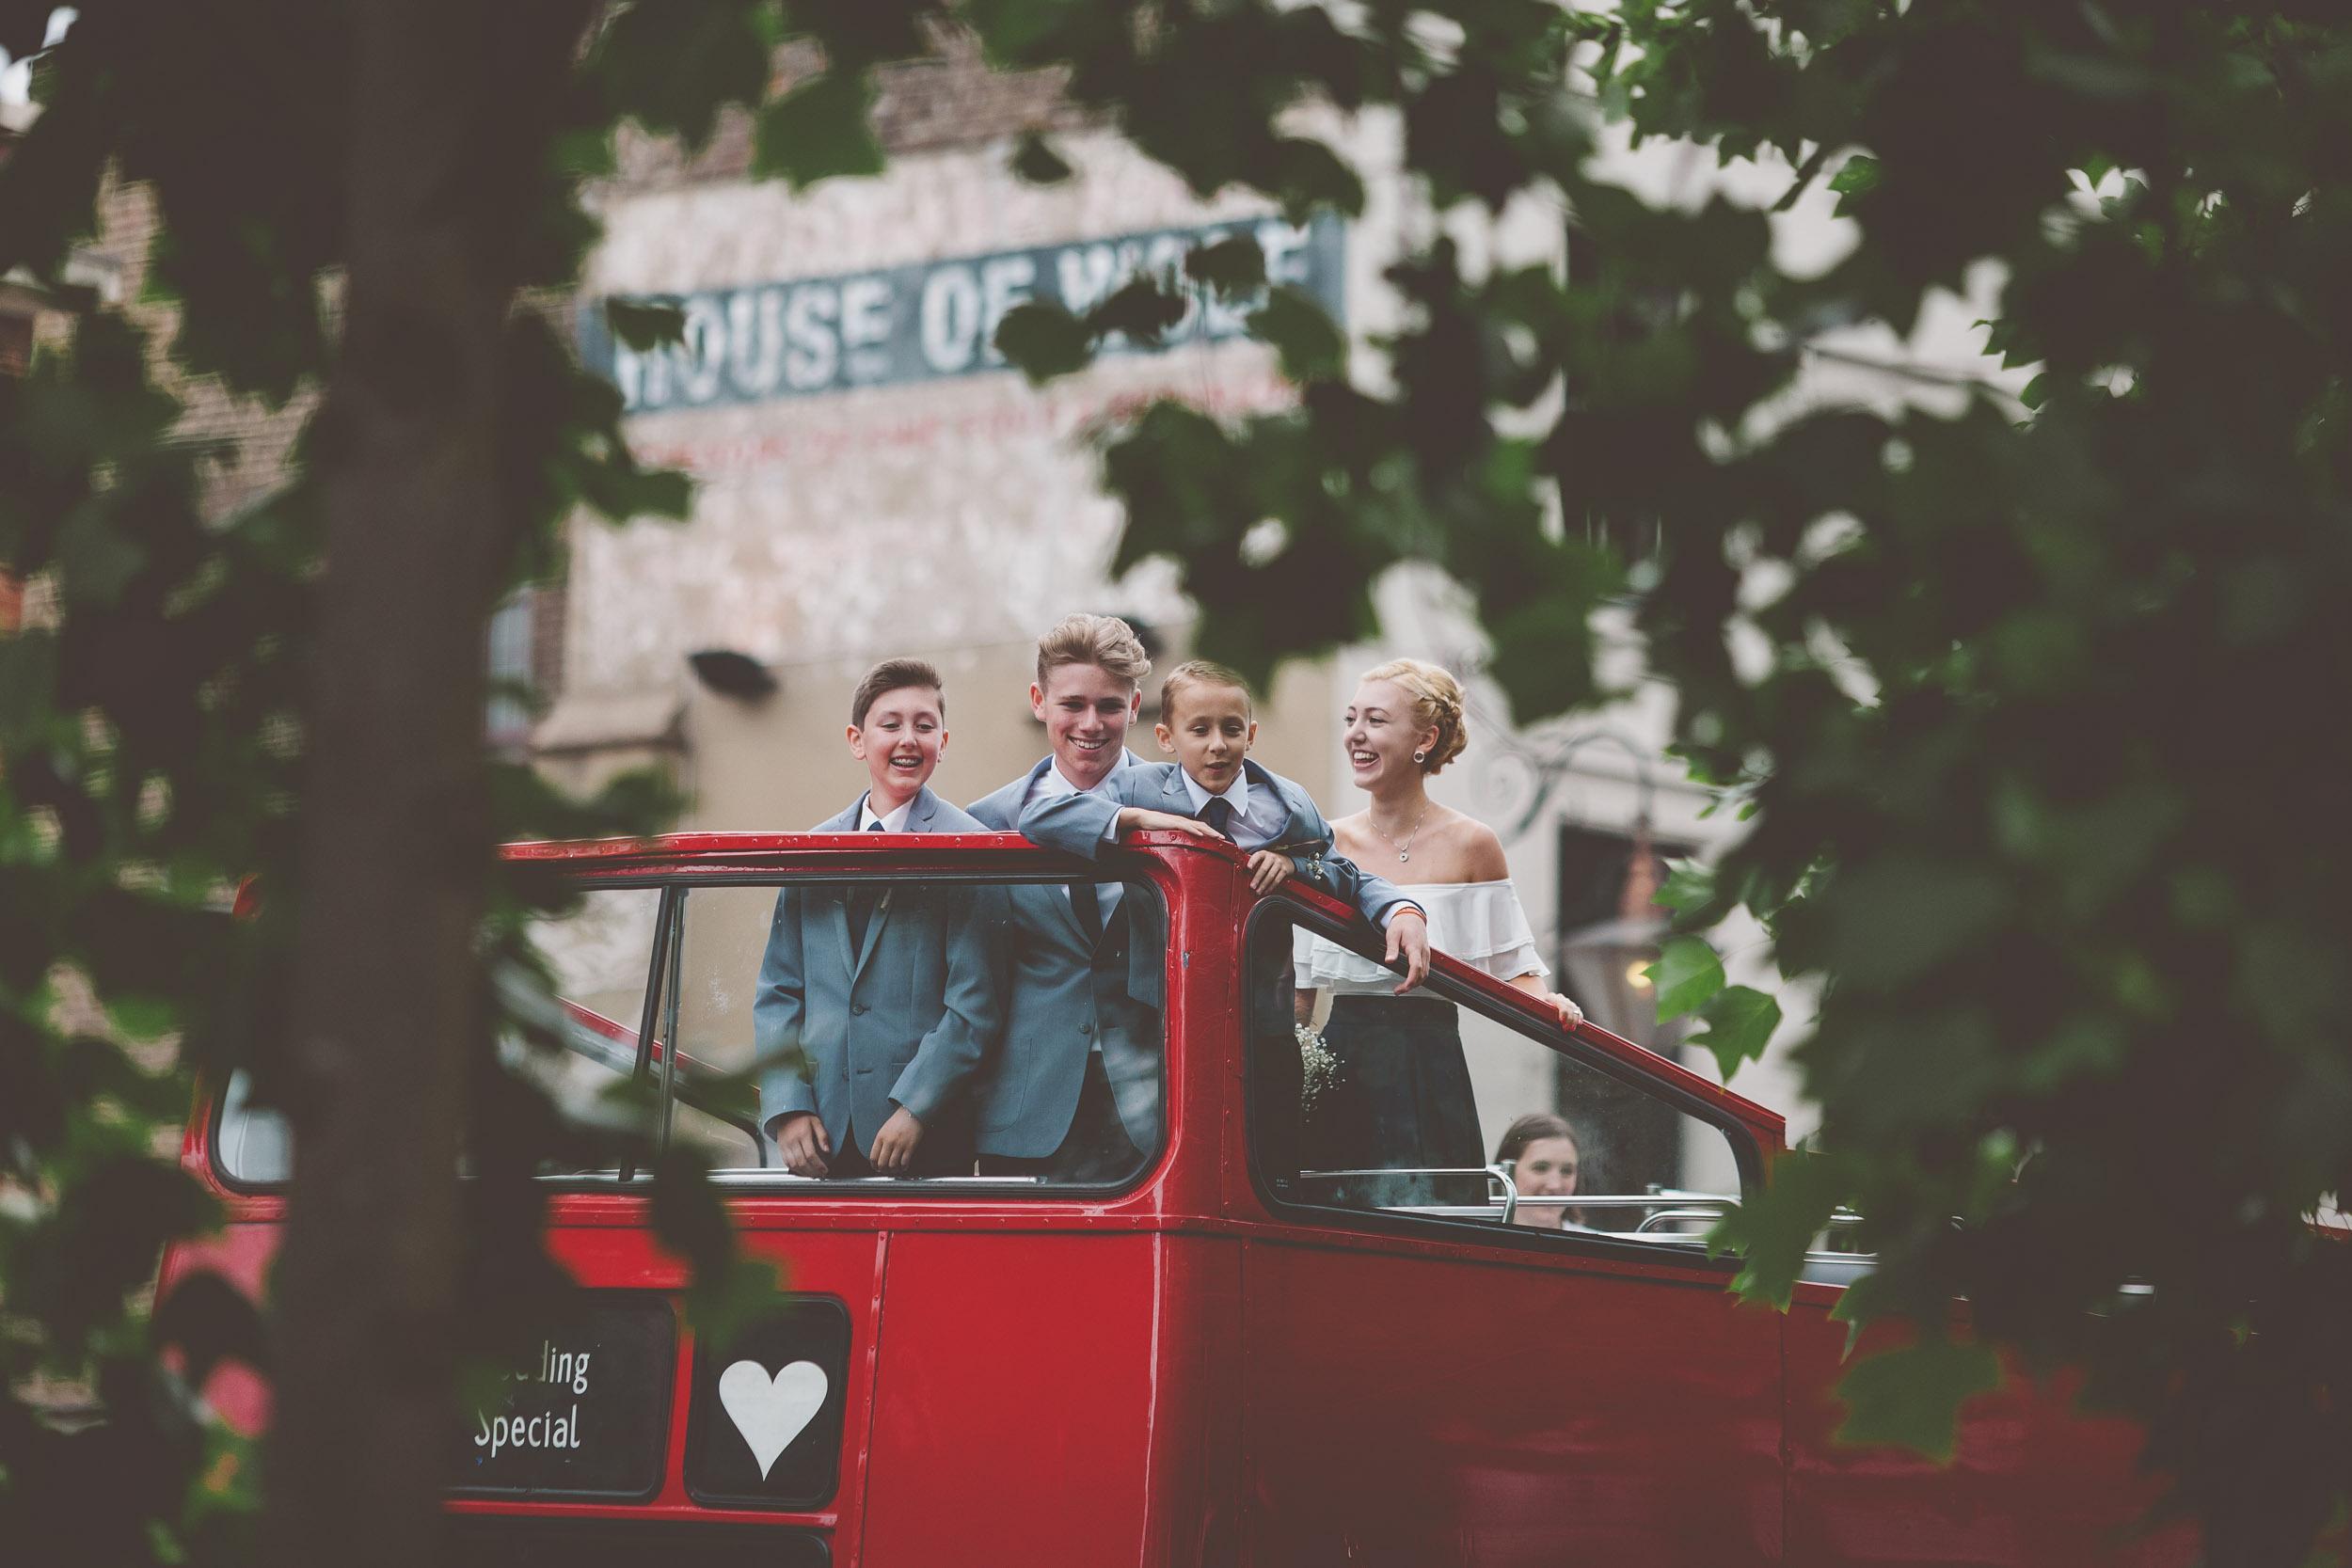 islington-town-hall-4th-floor-studios-wedding175.jpg